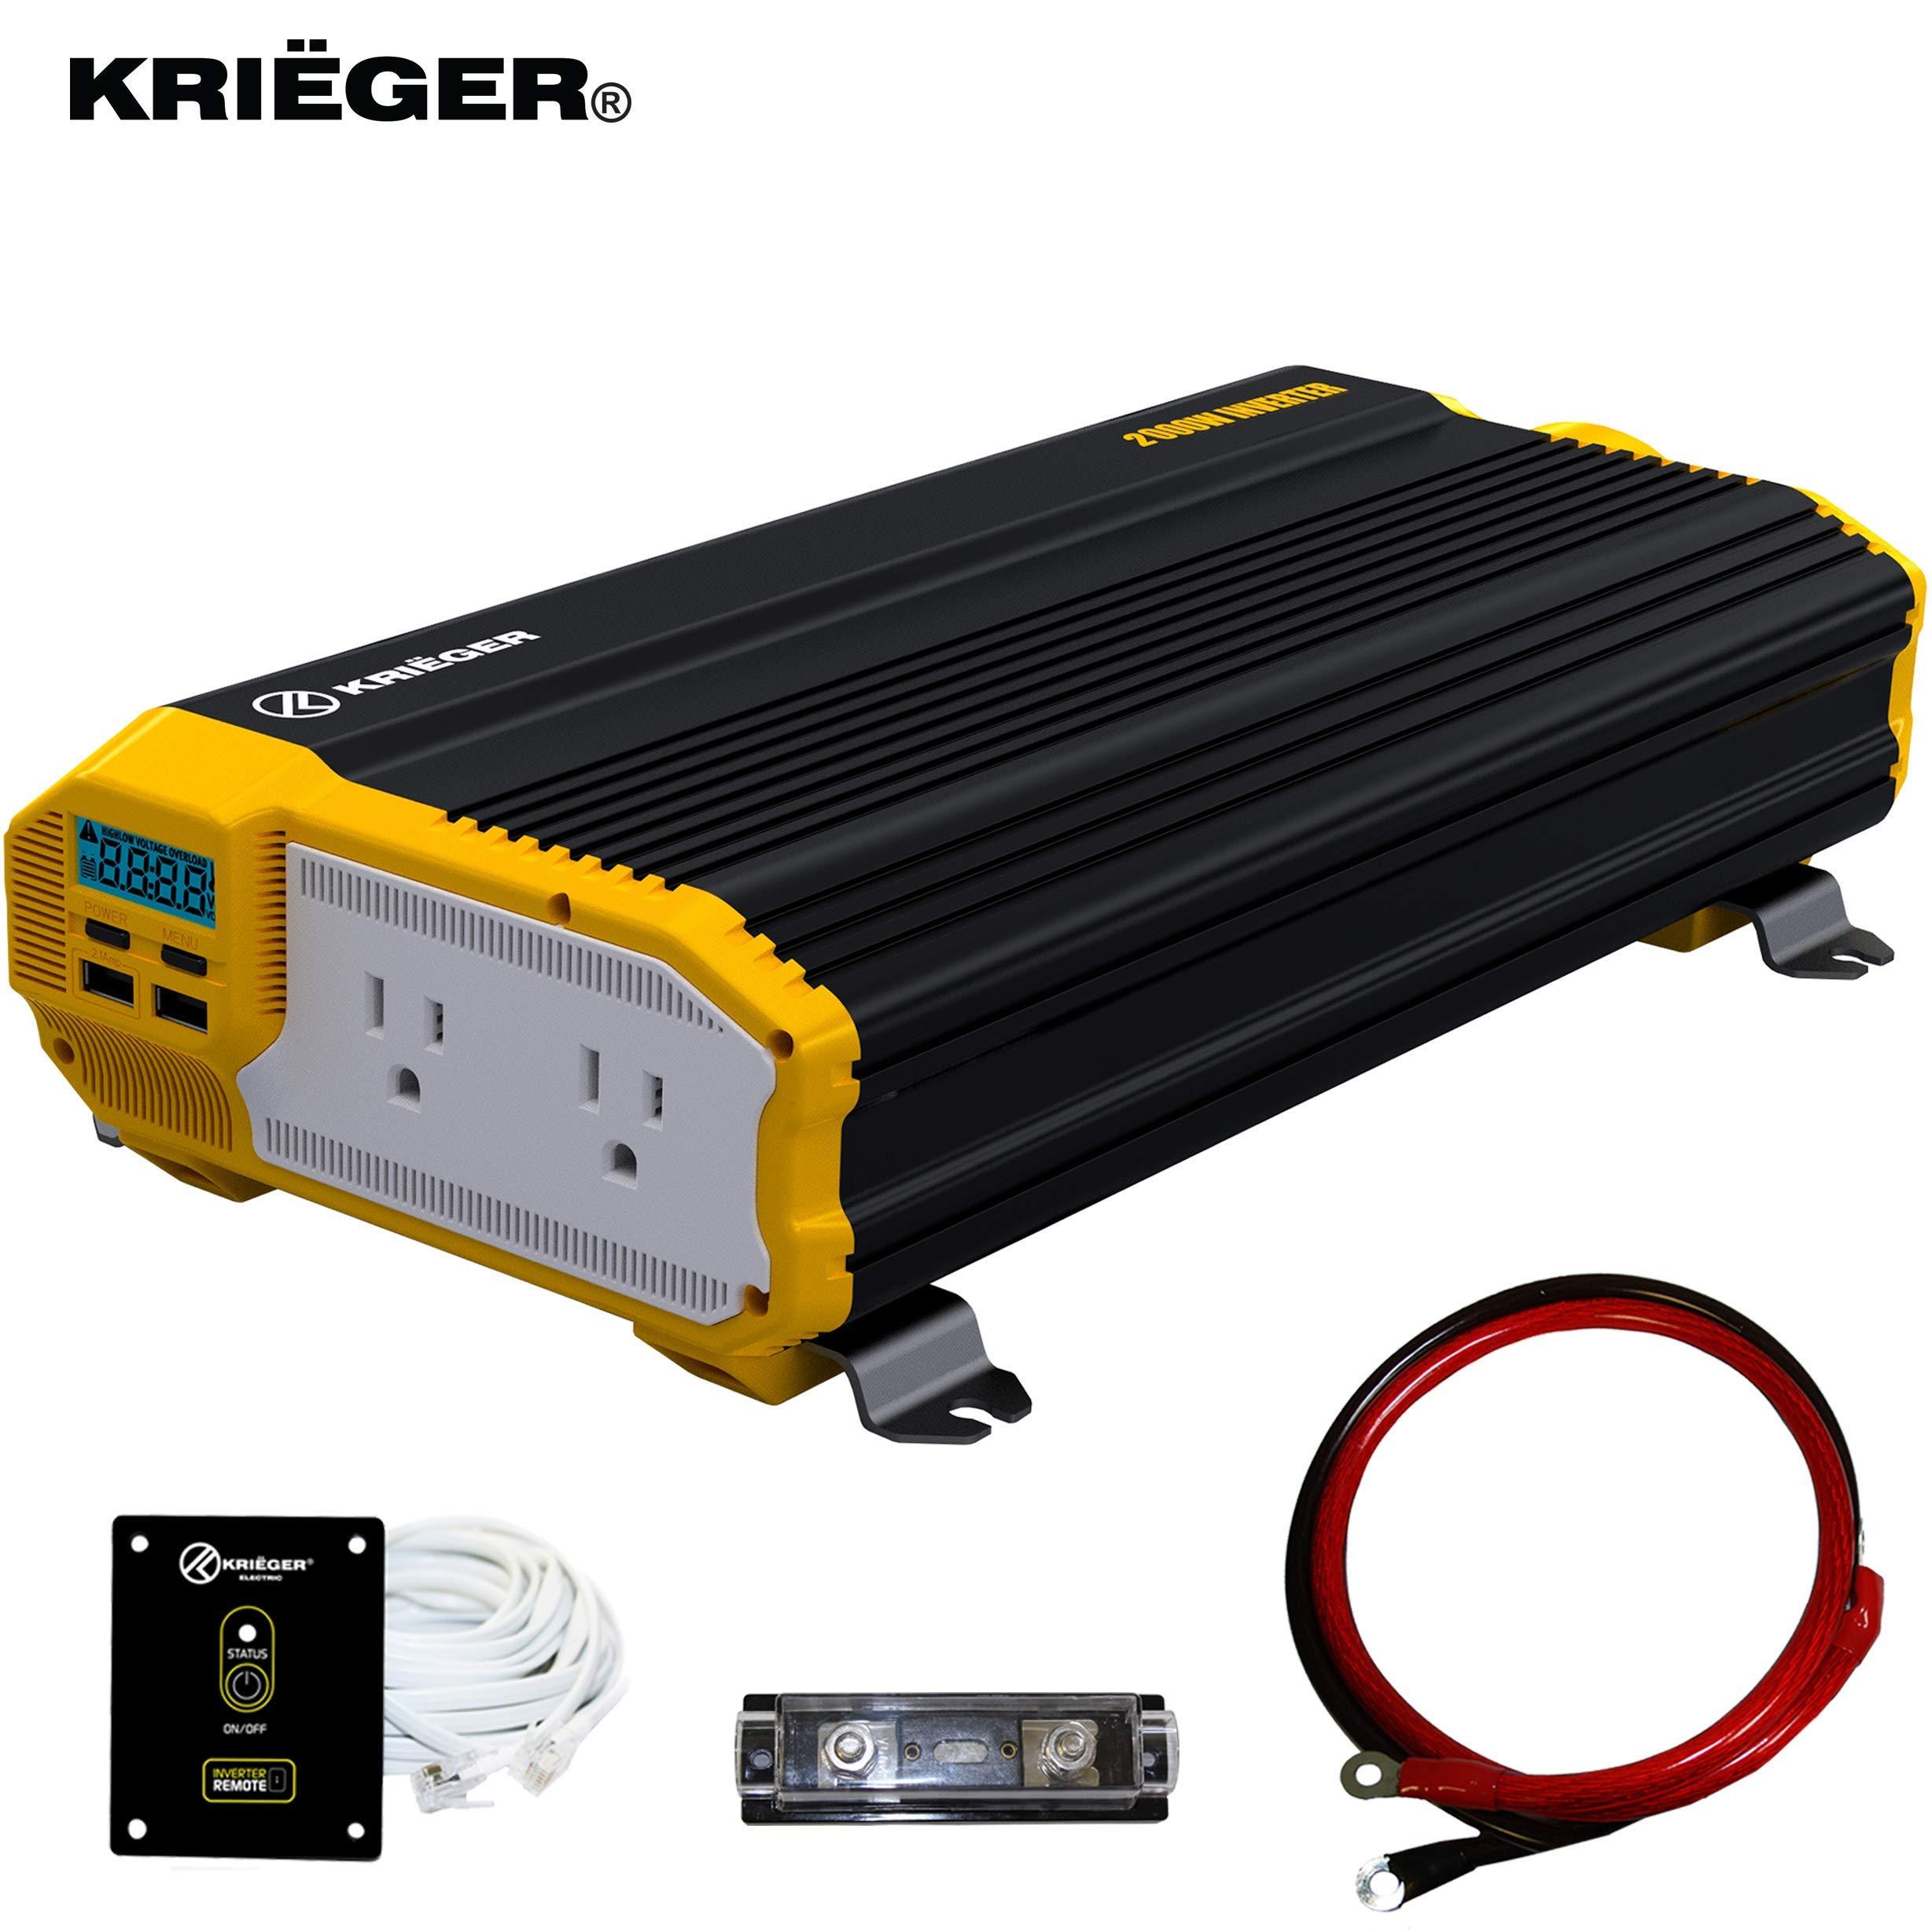 KRI%C3%8BGER Installation appliances According Standards